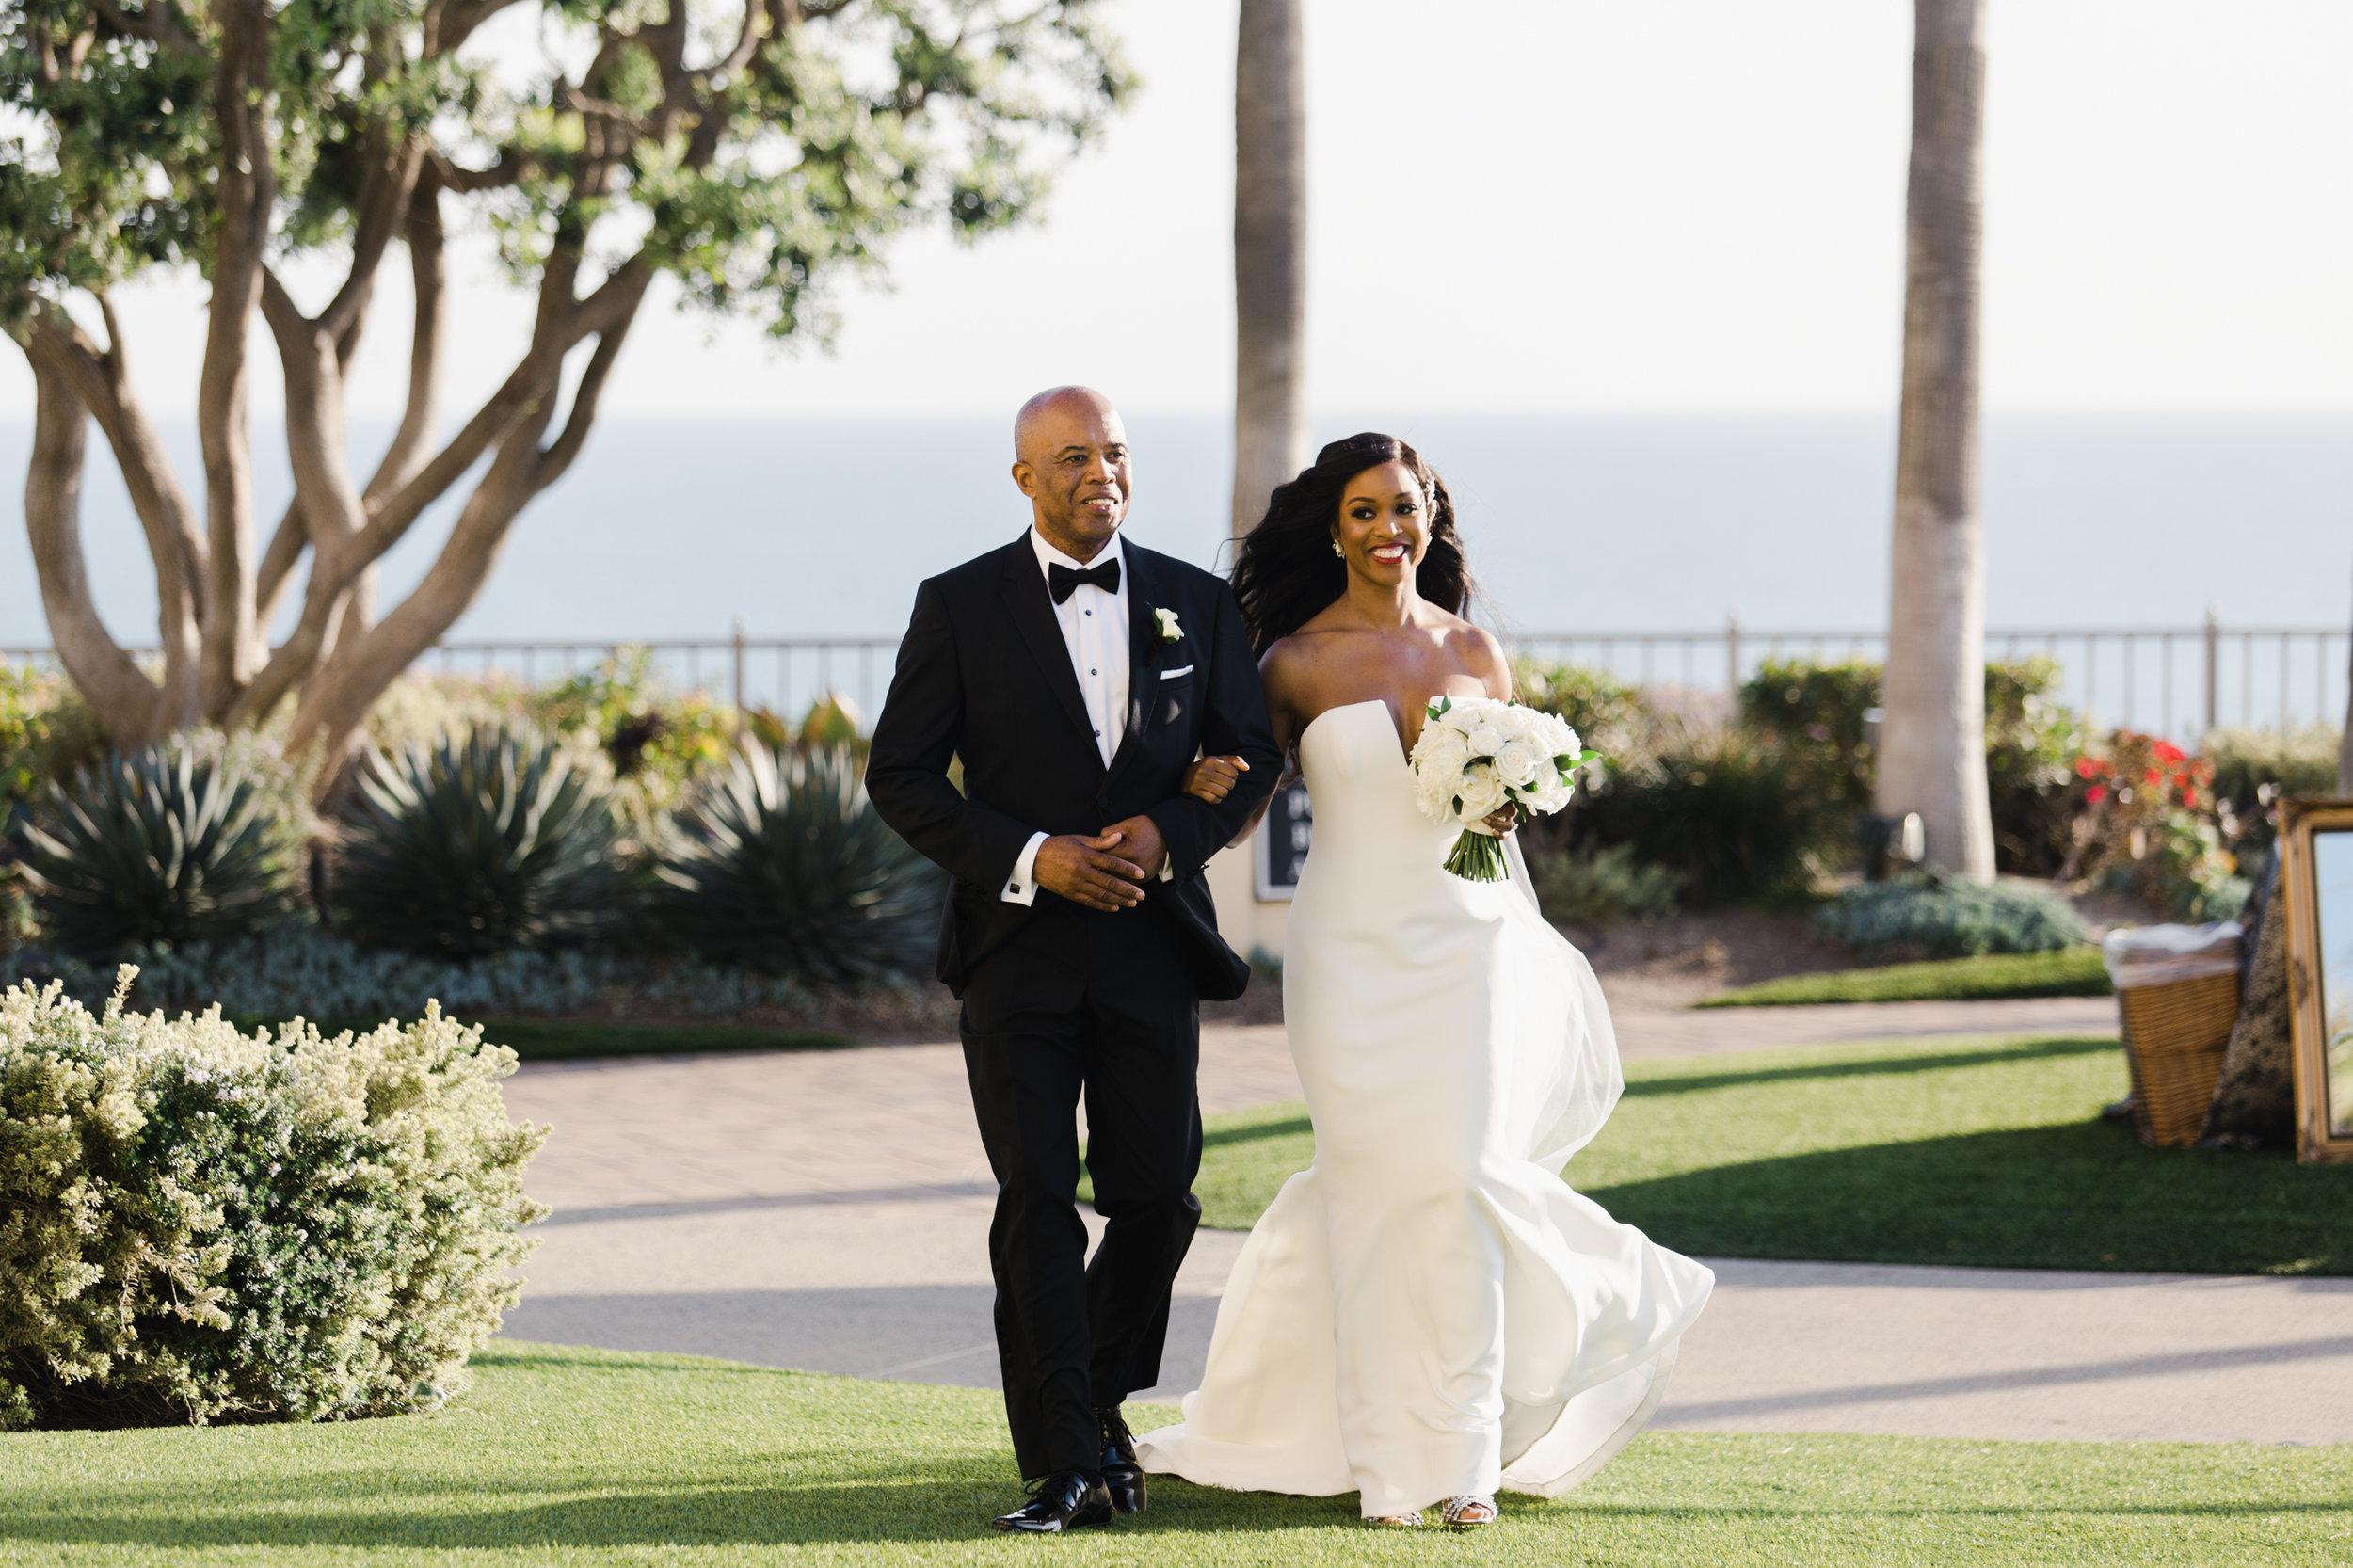 ritz-carlton-laguna-niguel-wedding-sonya_0118.JPG